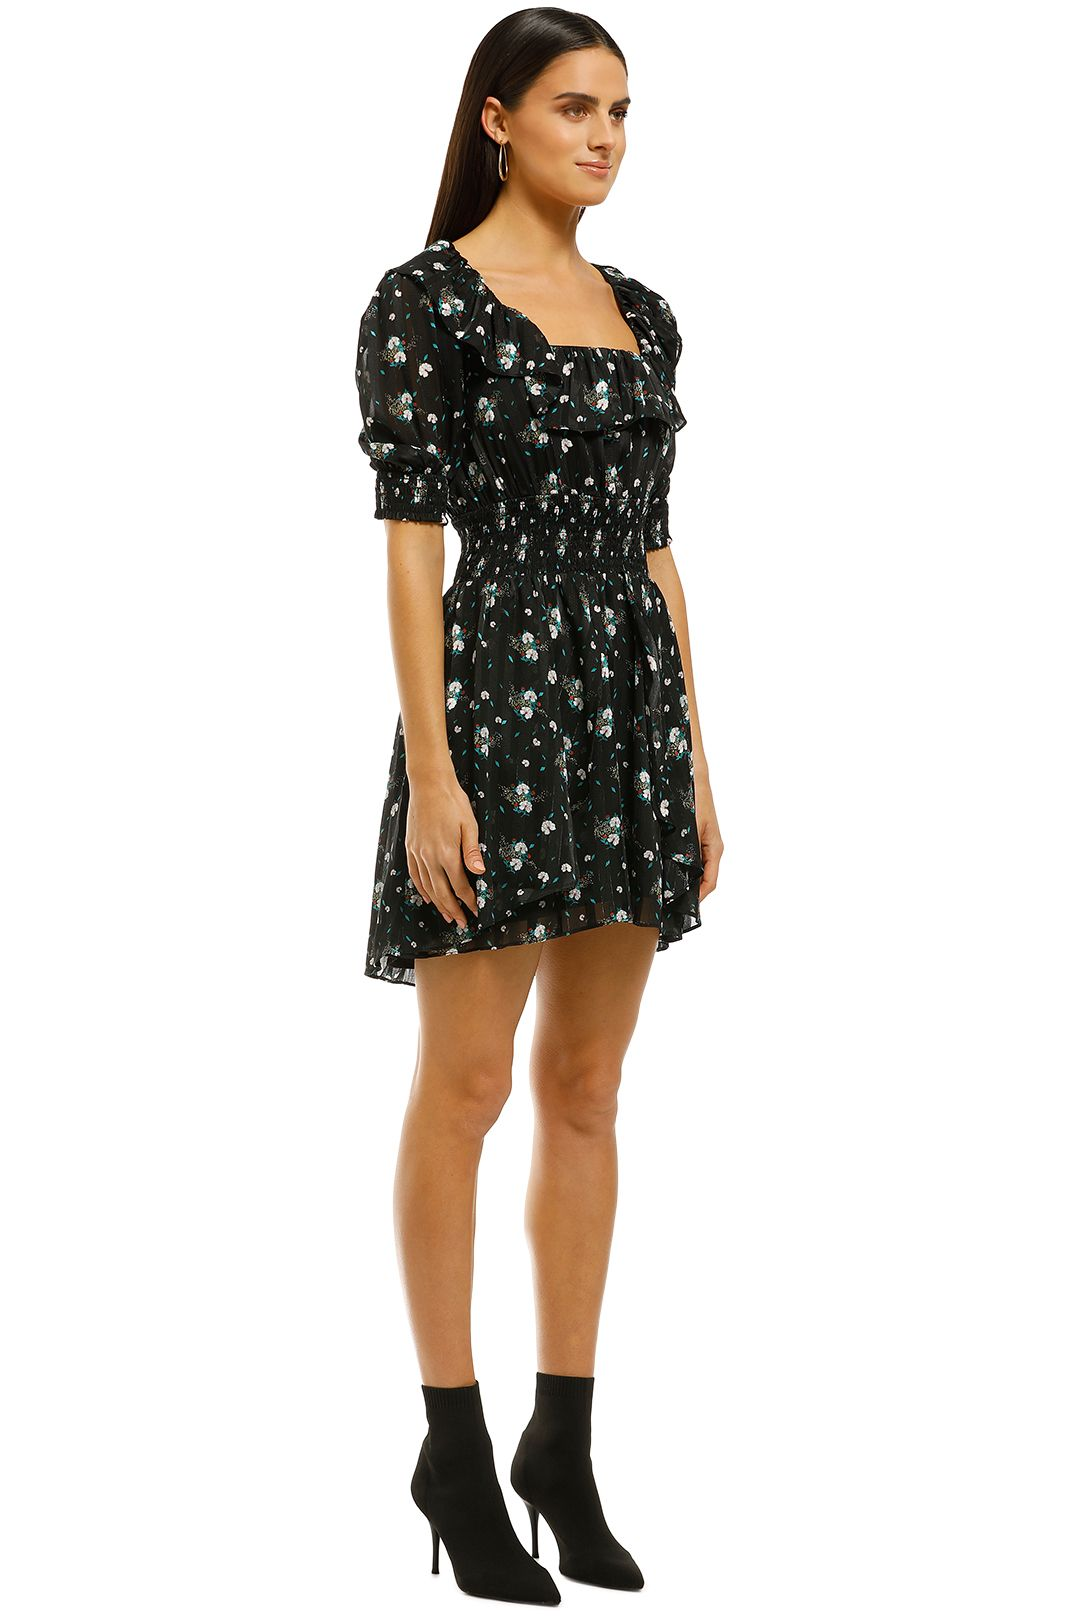 Elliatt - Posy Dress - Black Floral - Side